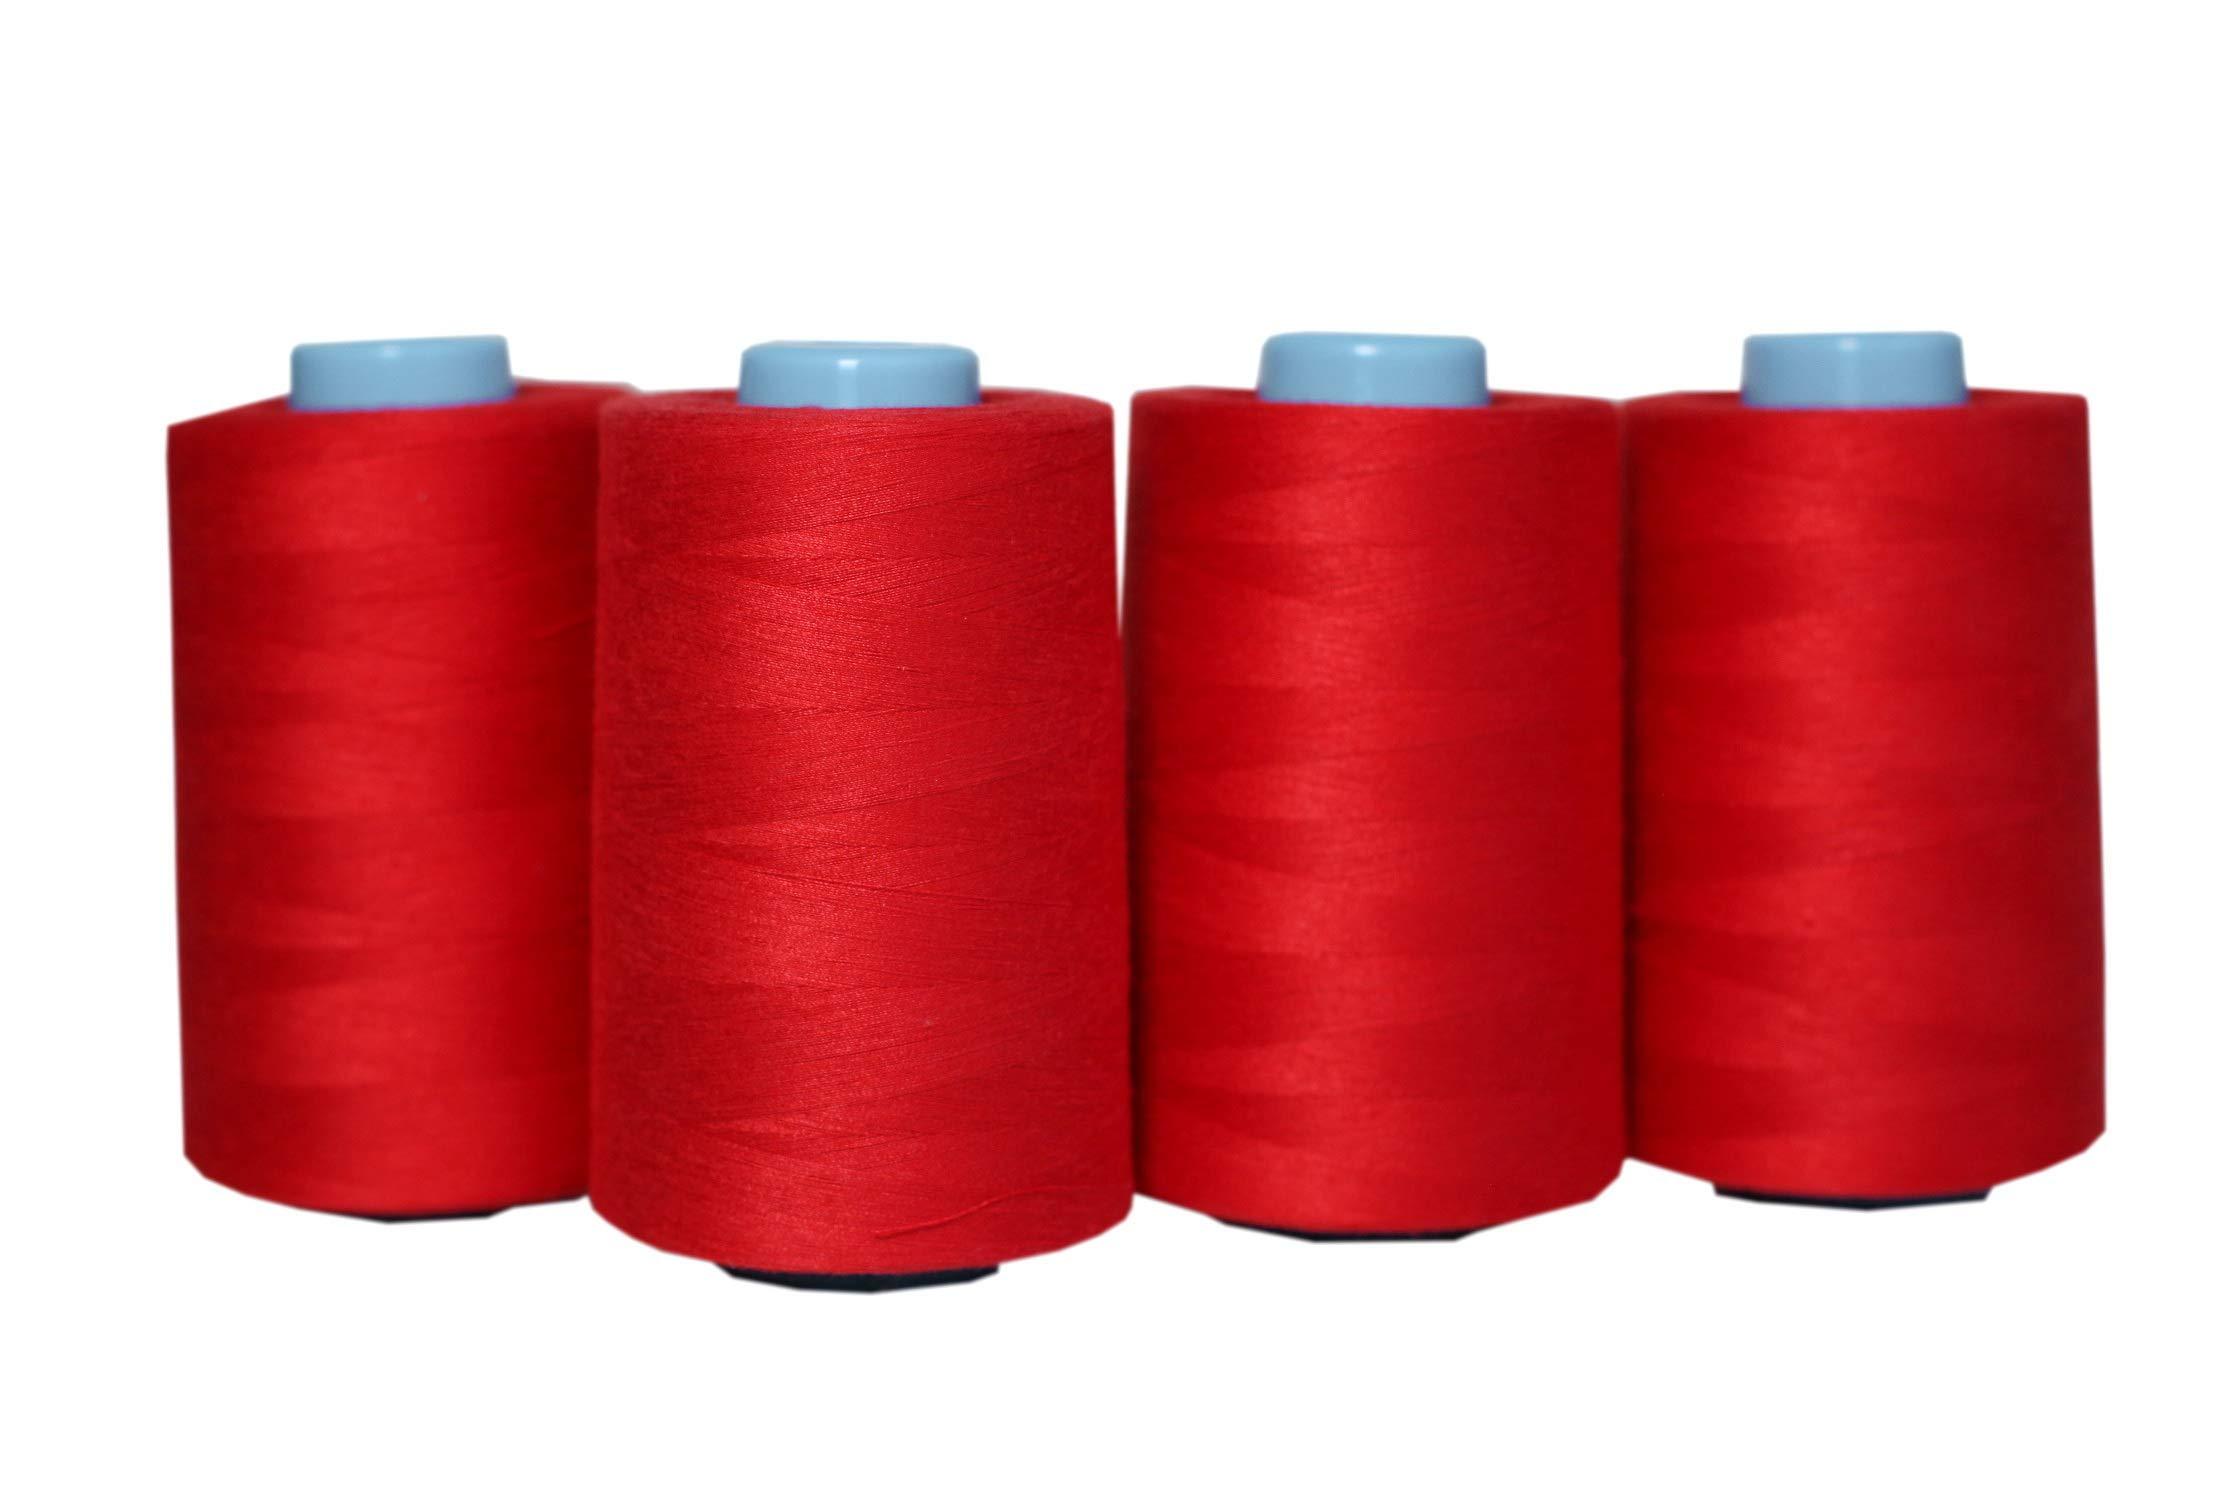 Serger Sewing Purpose Polyester overlock